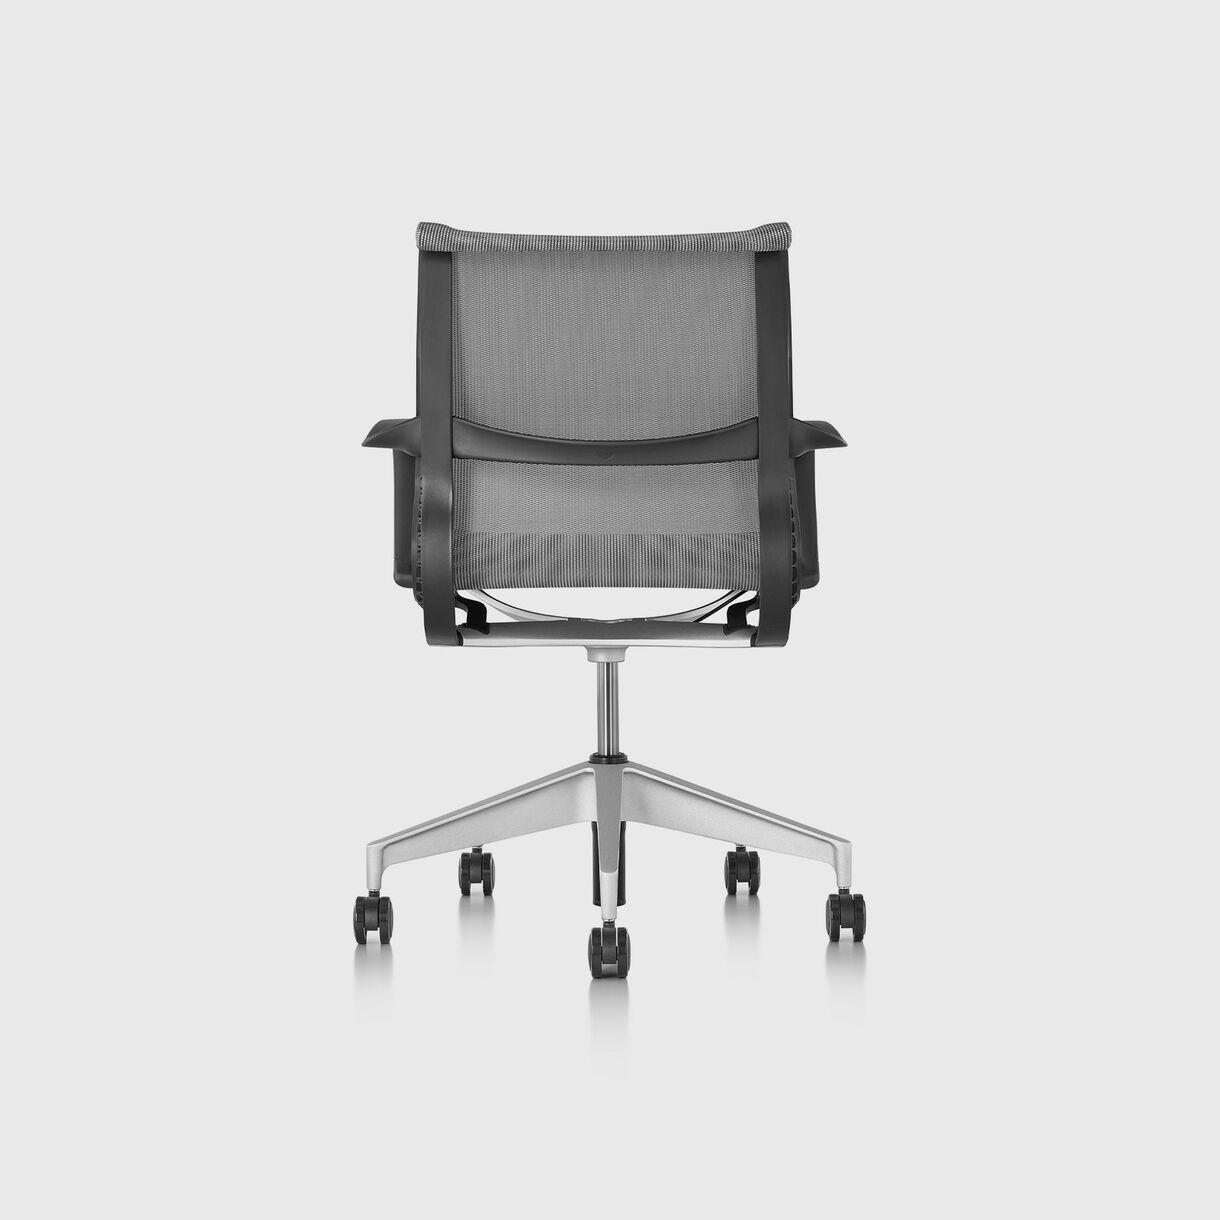 Setu Chair - Graphite, Graphite Frame, Silver Alloy Base